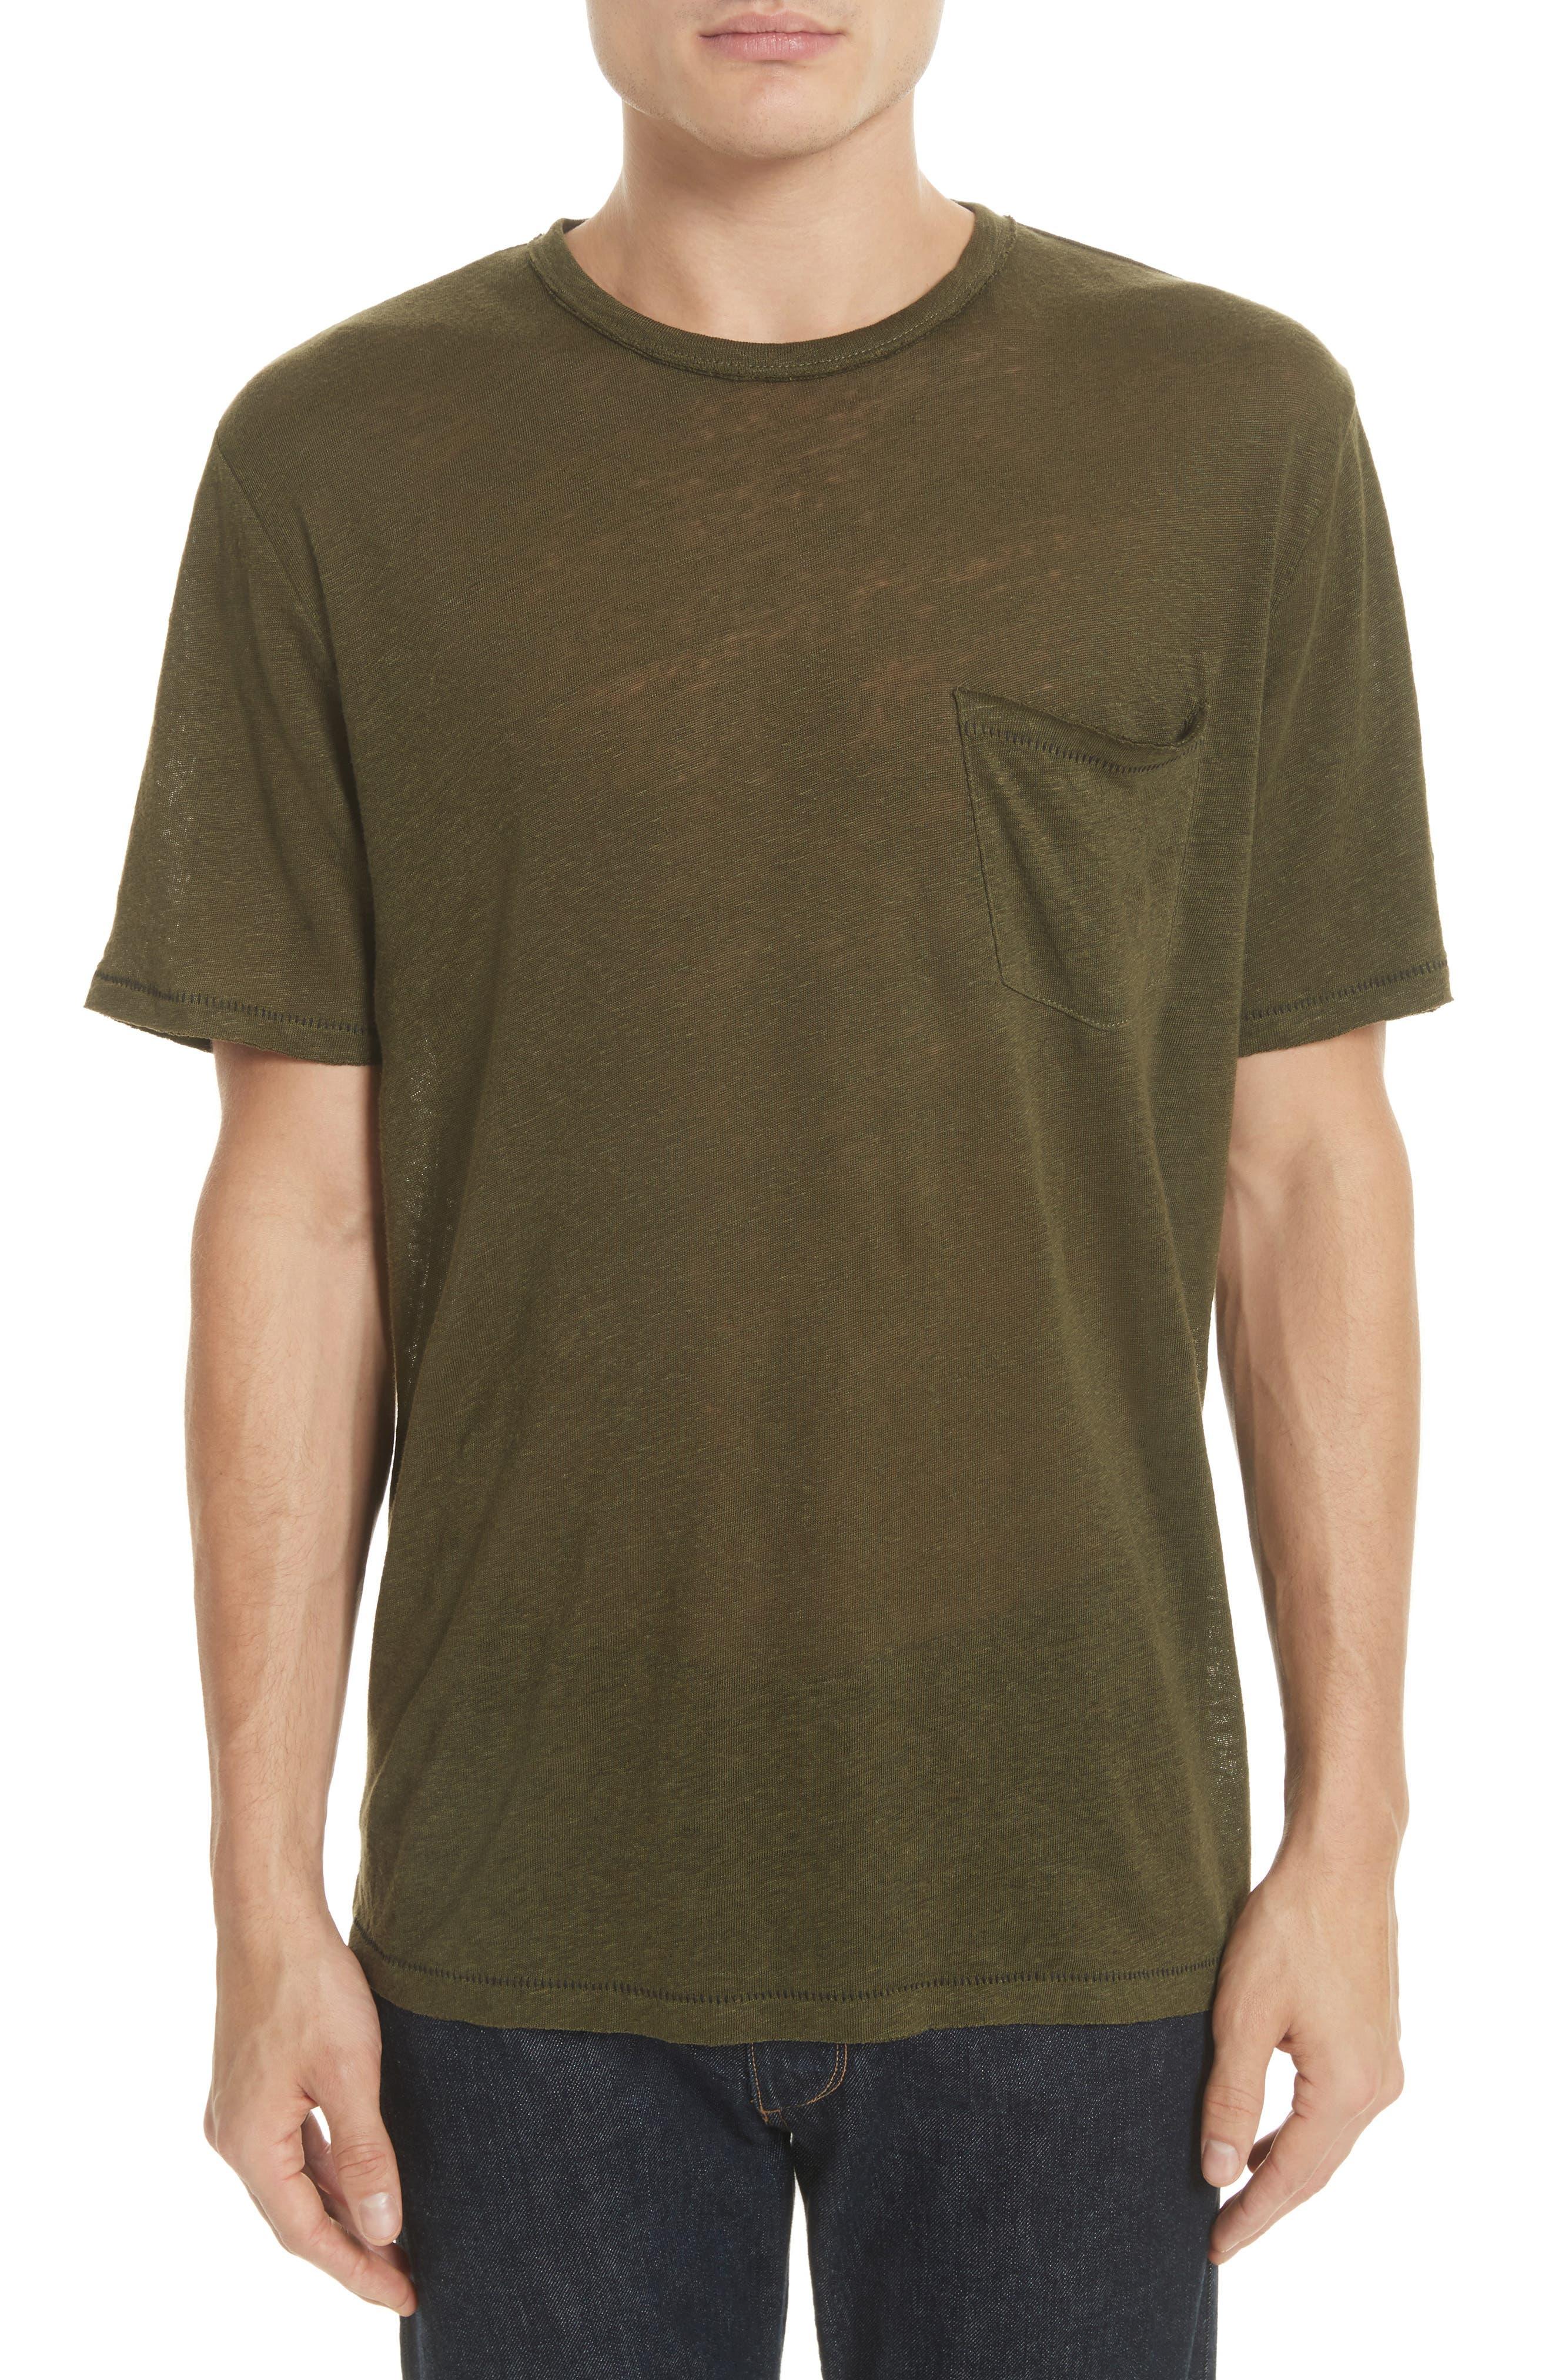 Owen T-Shirt,                             Main thumbnail 1, color,                             Army